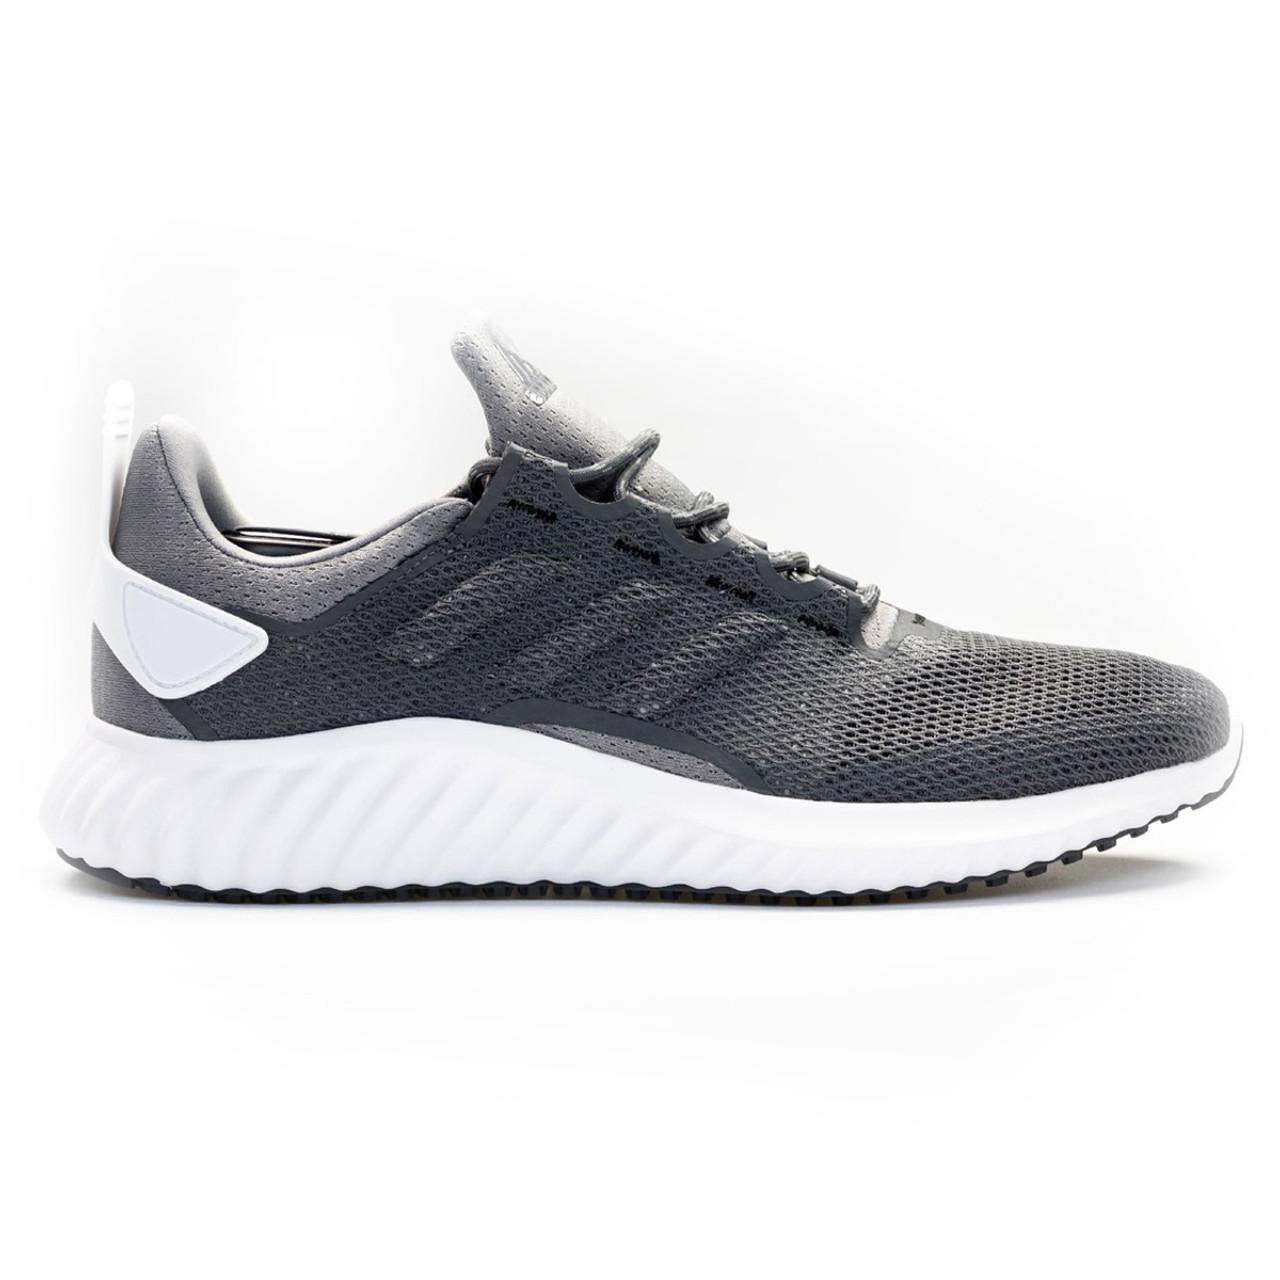 8741d9fc3 Adidas Alphabounce Cityrun CC Men s Sneakers AC8183 - Gray